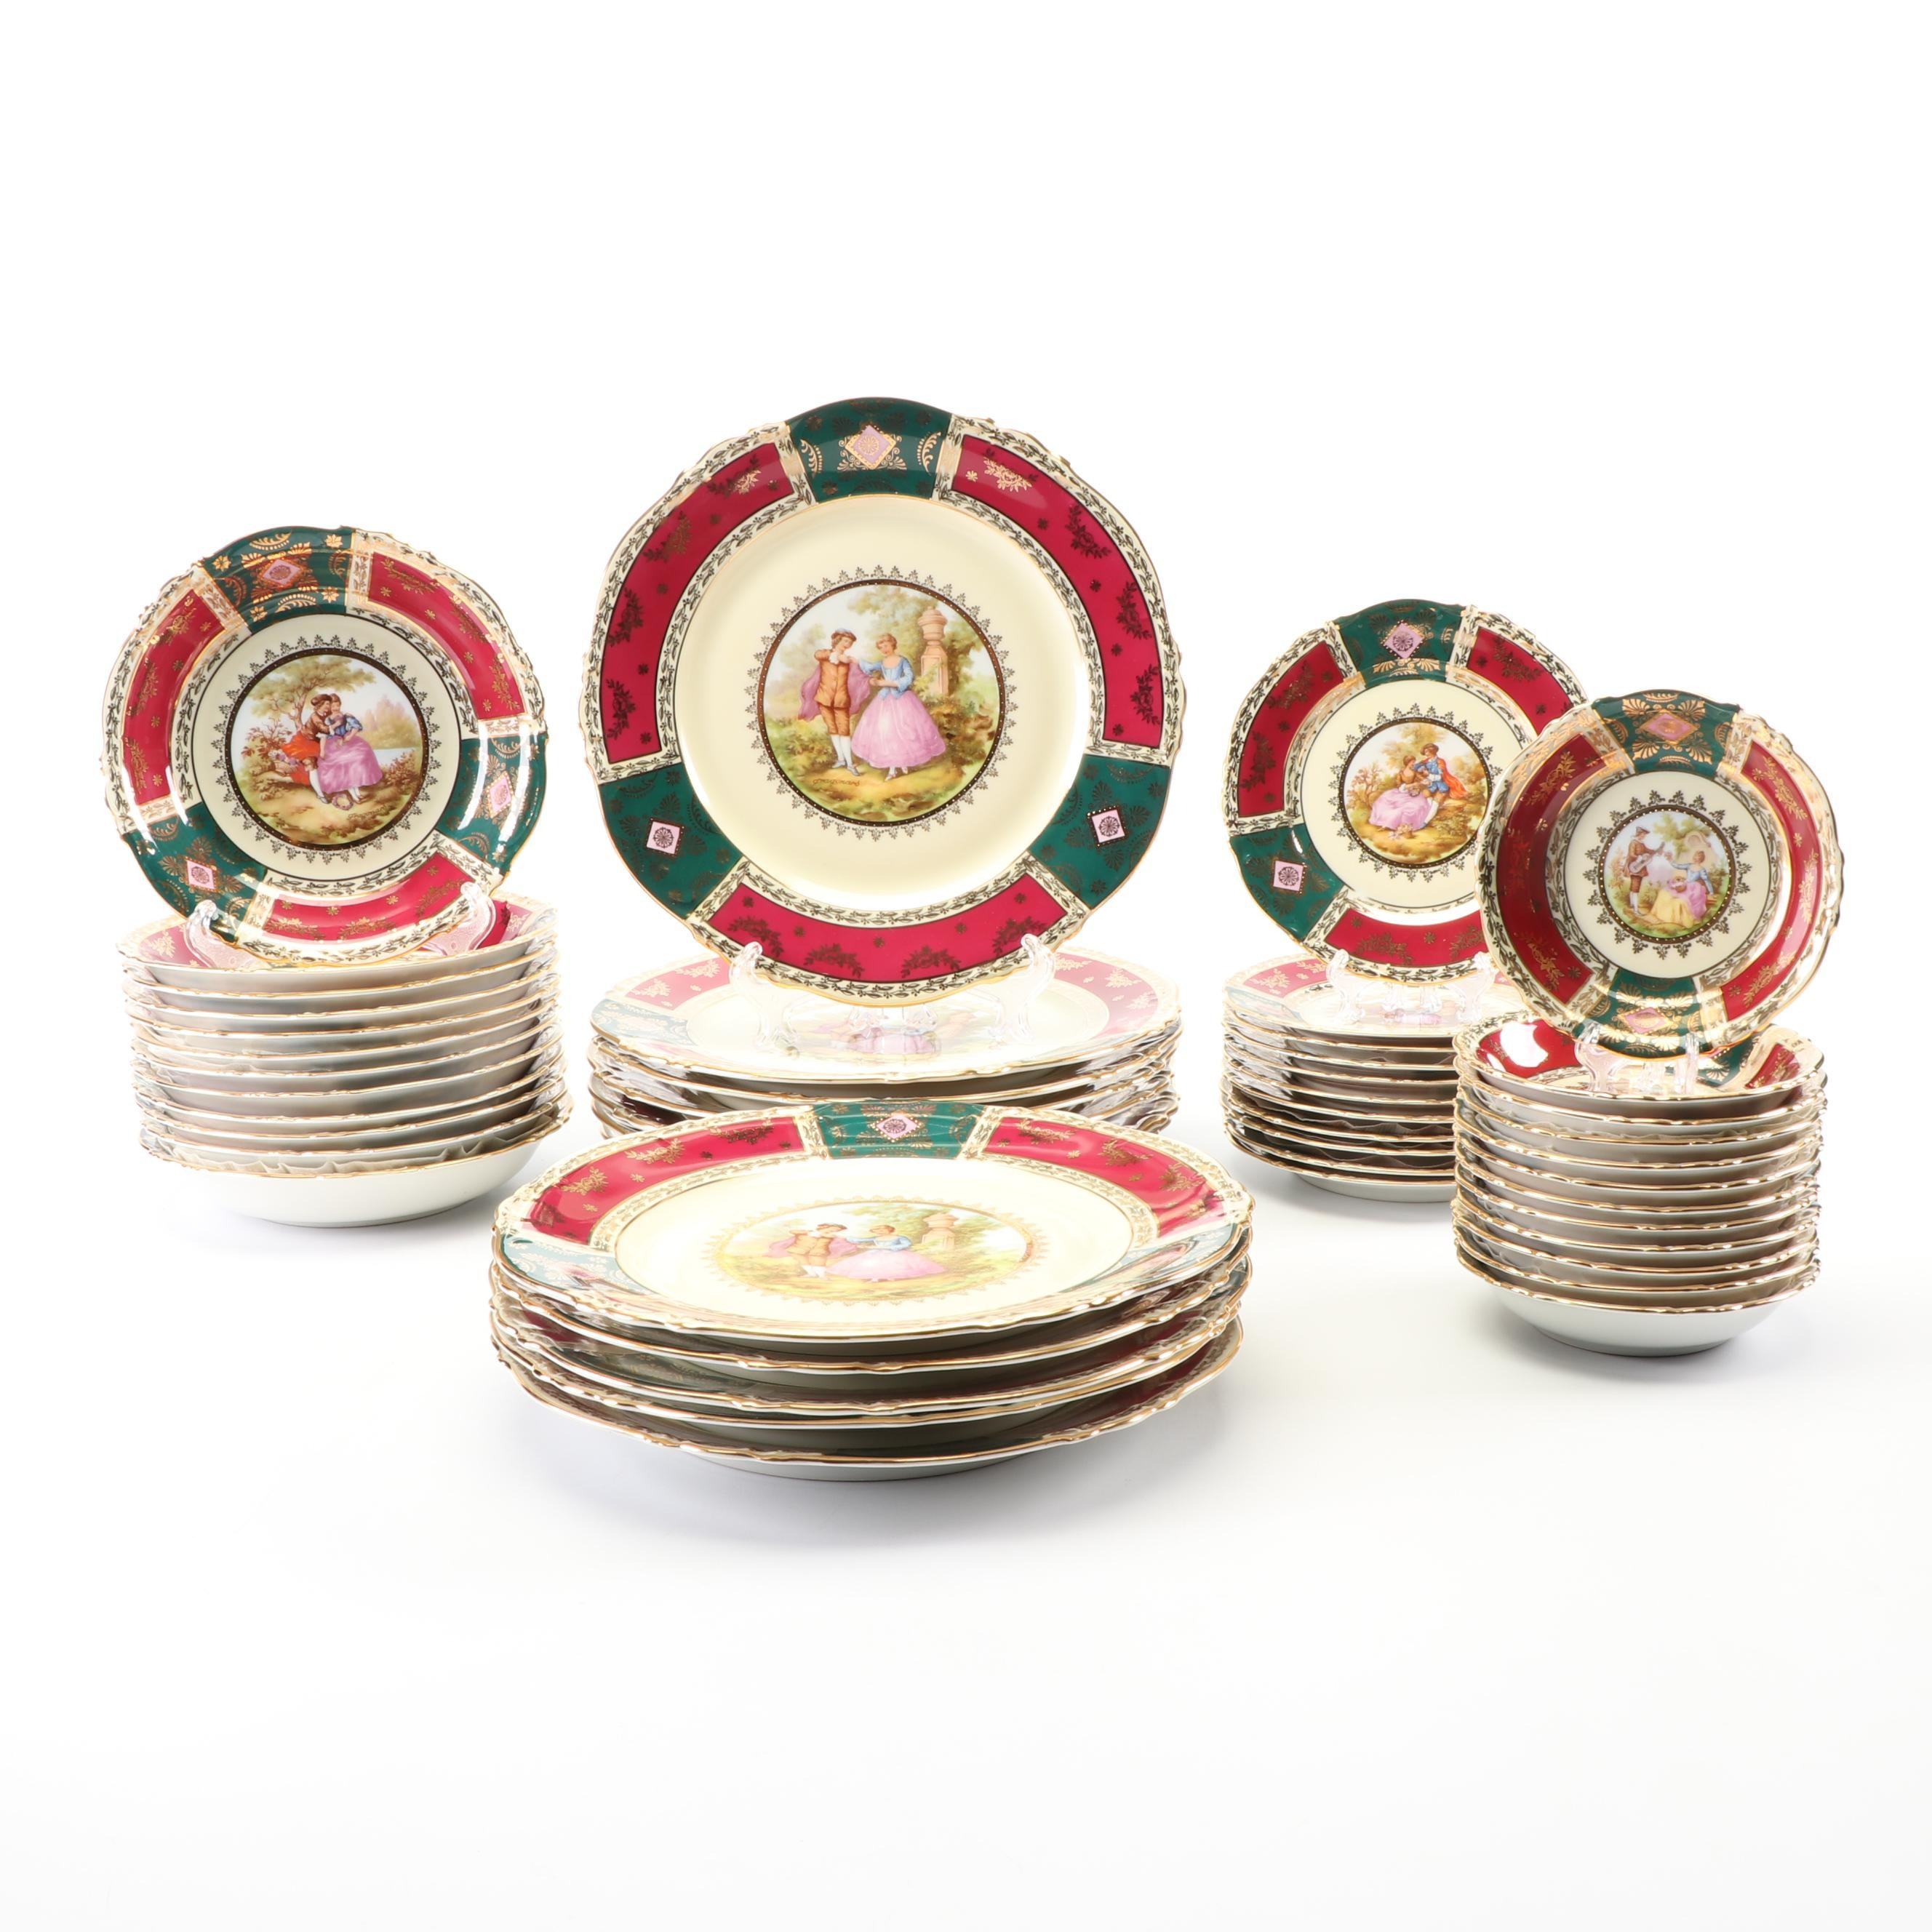 Josef Kuba Porcelain Dinnerware, circa 1945-52